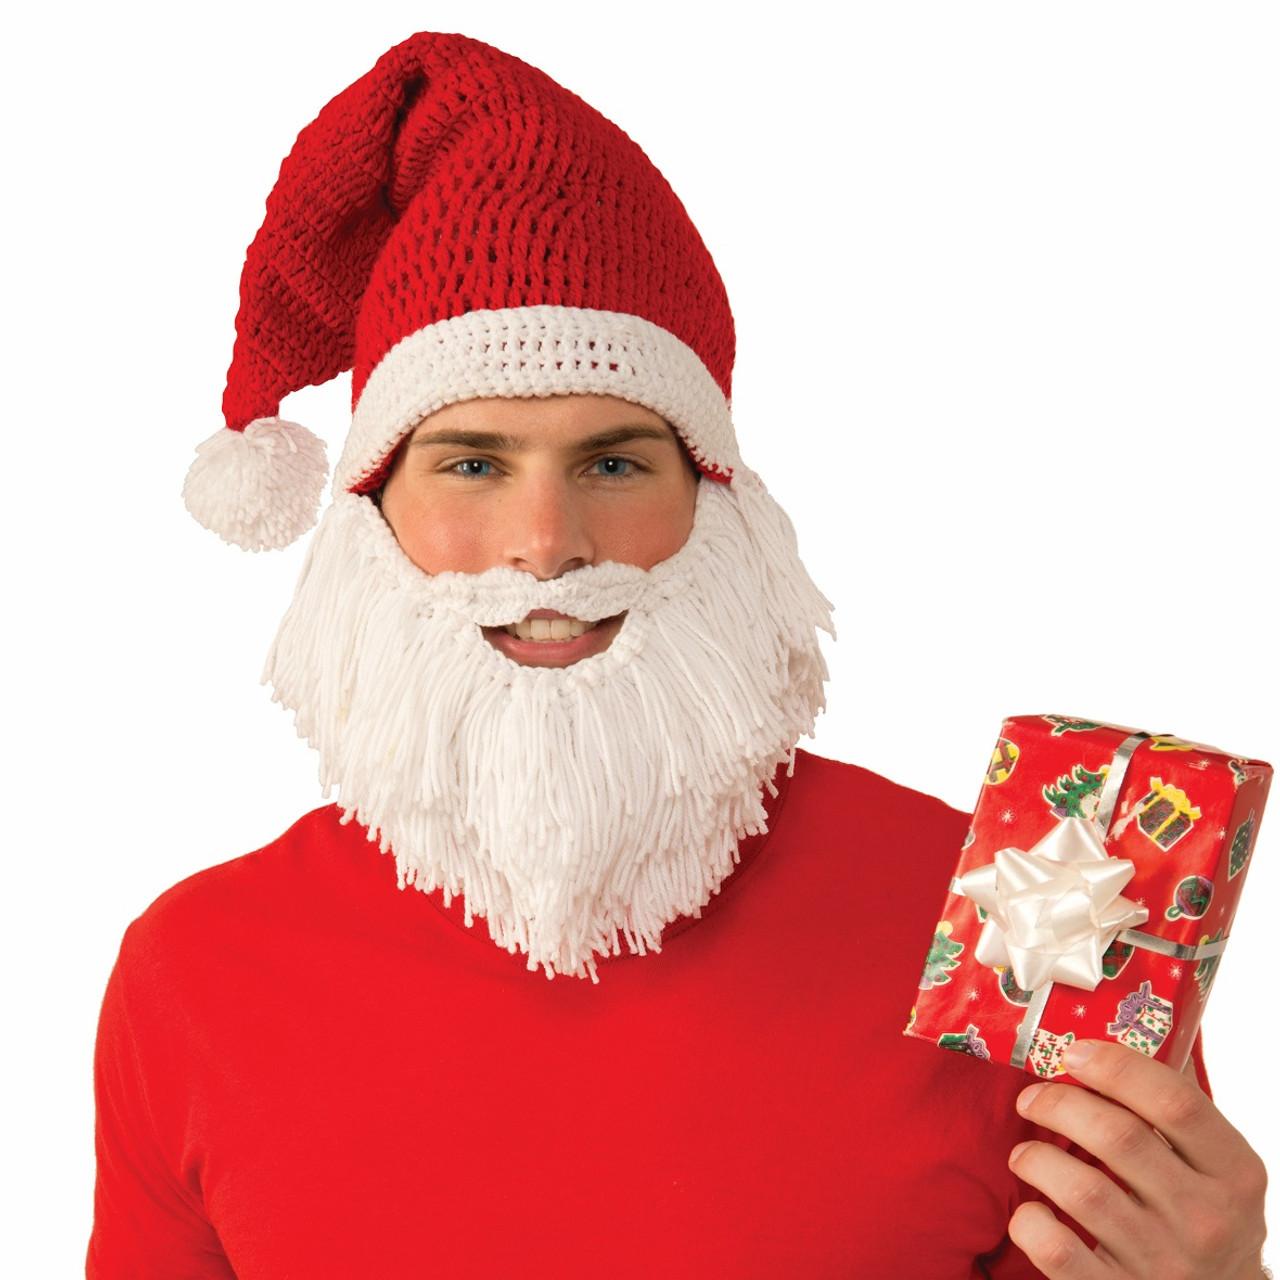 e85a7f1e264d6 Knitted Santa Hat